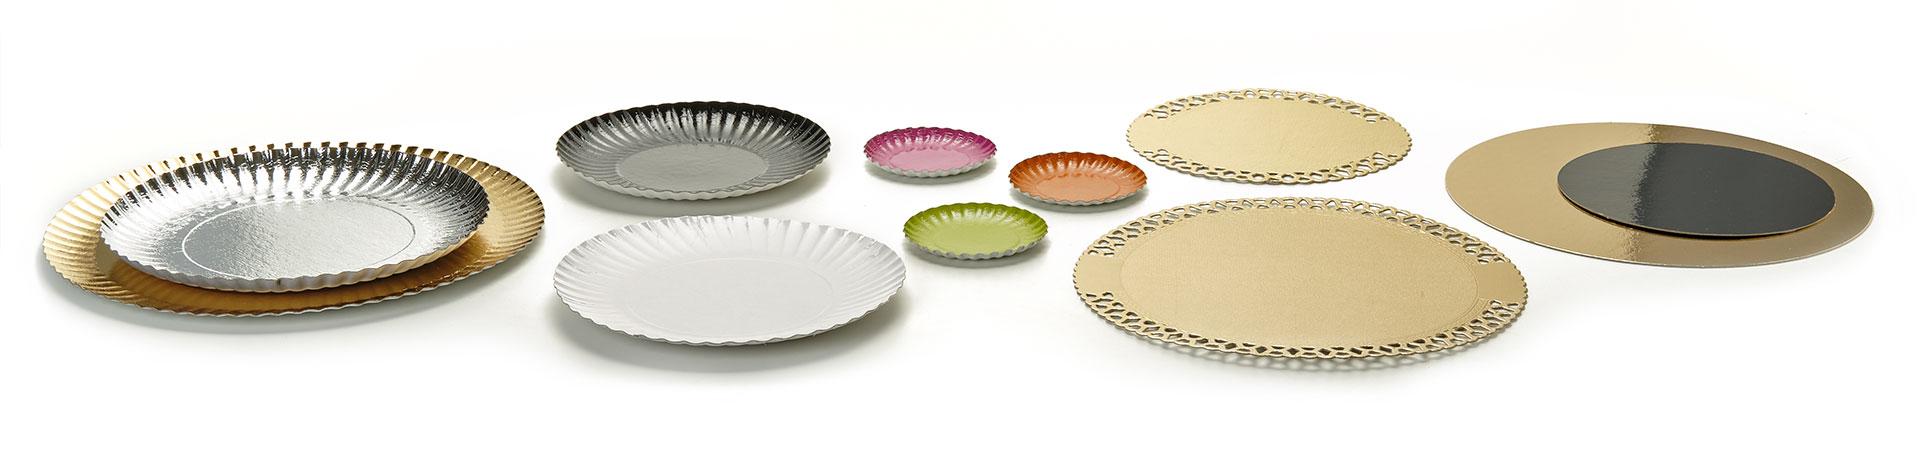 Novacart cardboard plates and disks